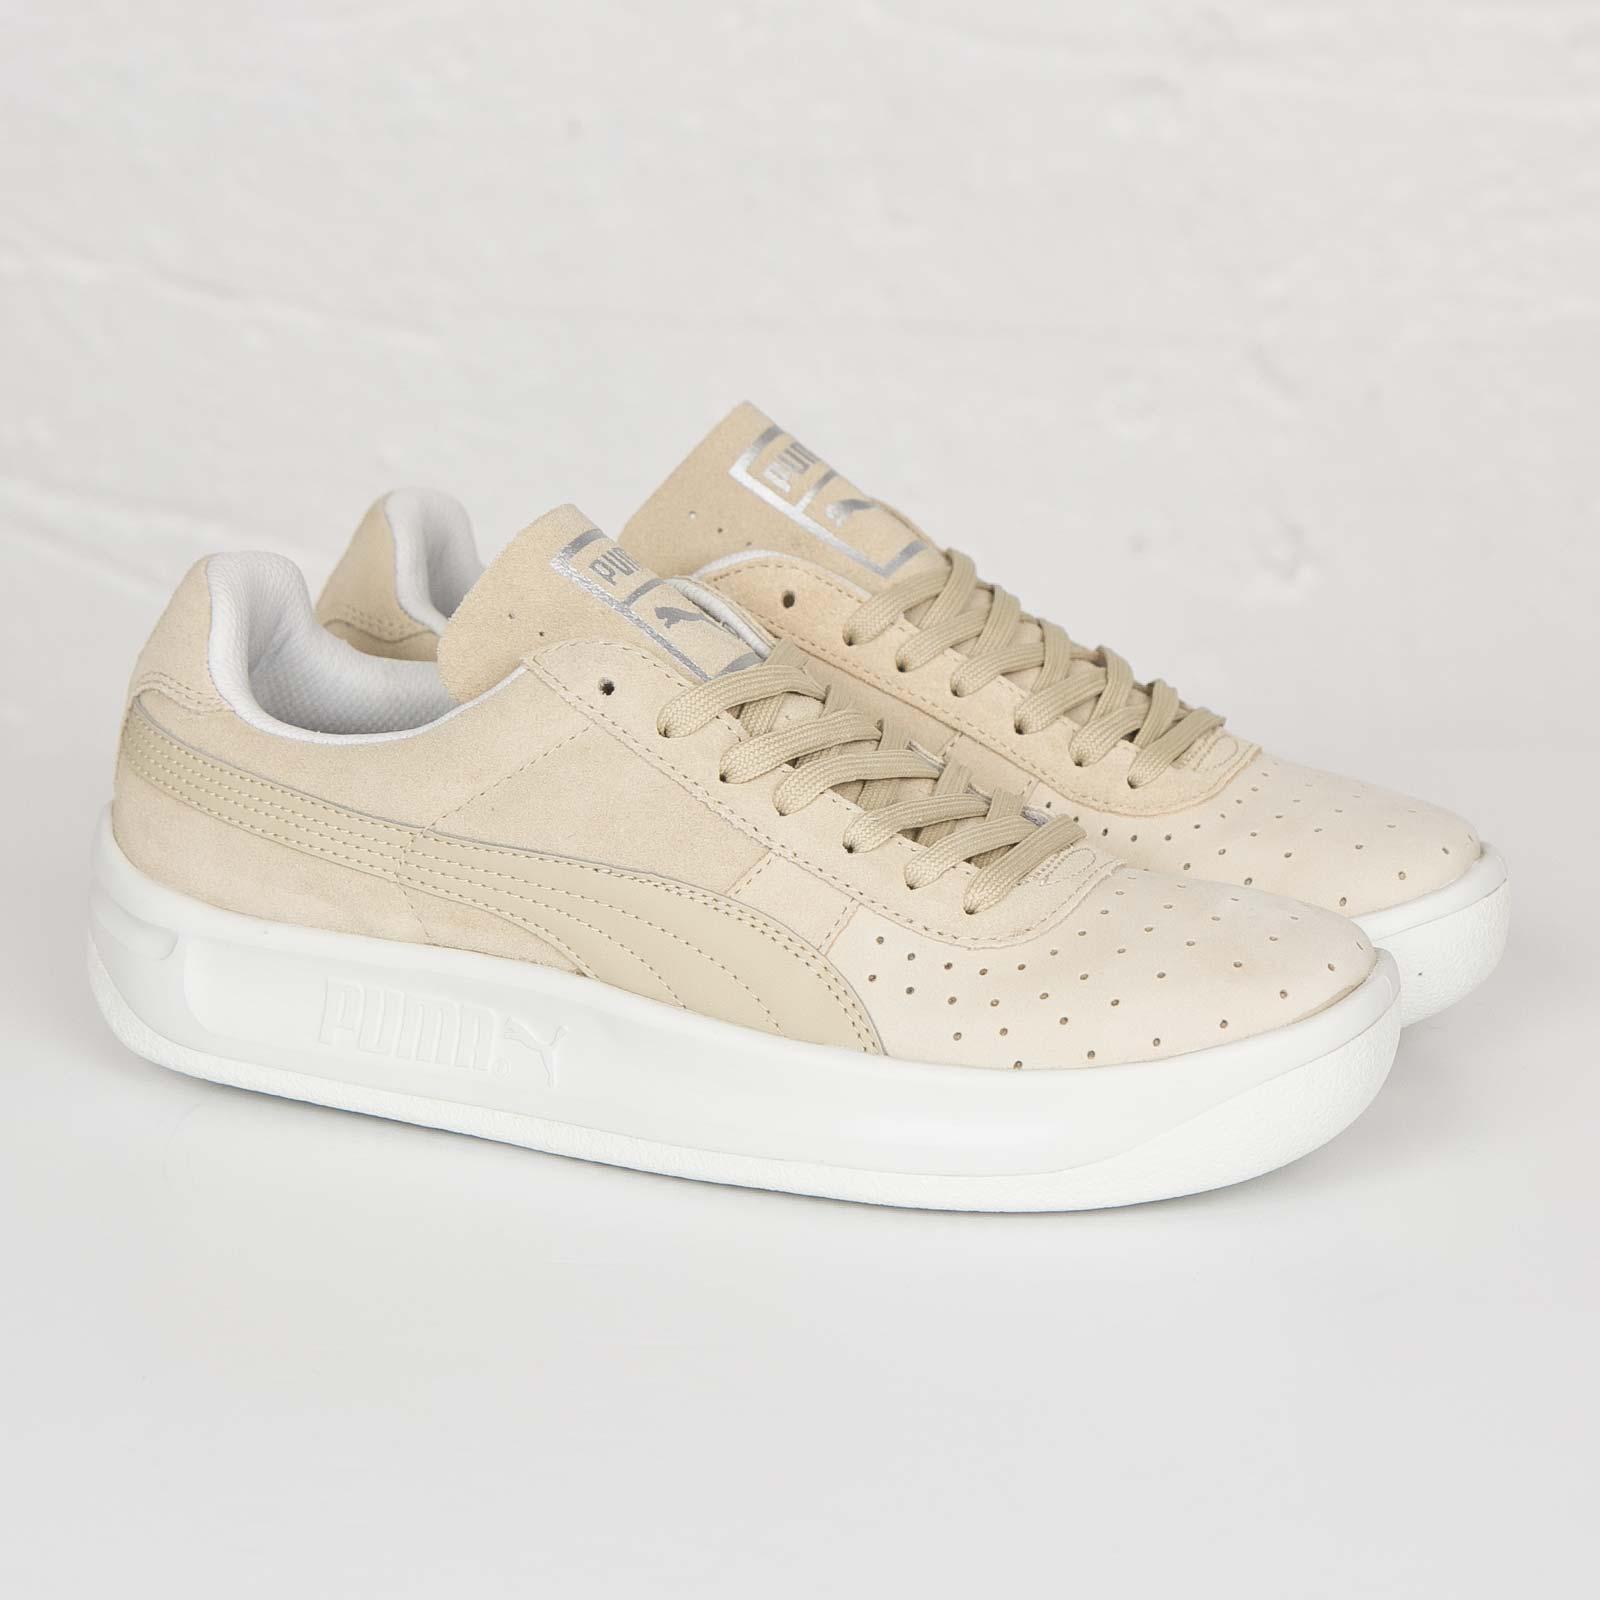 promo code f2a03 de190 Puma GV Special Wohnzimmer - 360854-01 - Sneakersnstuff ...